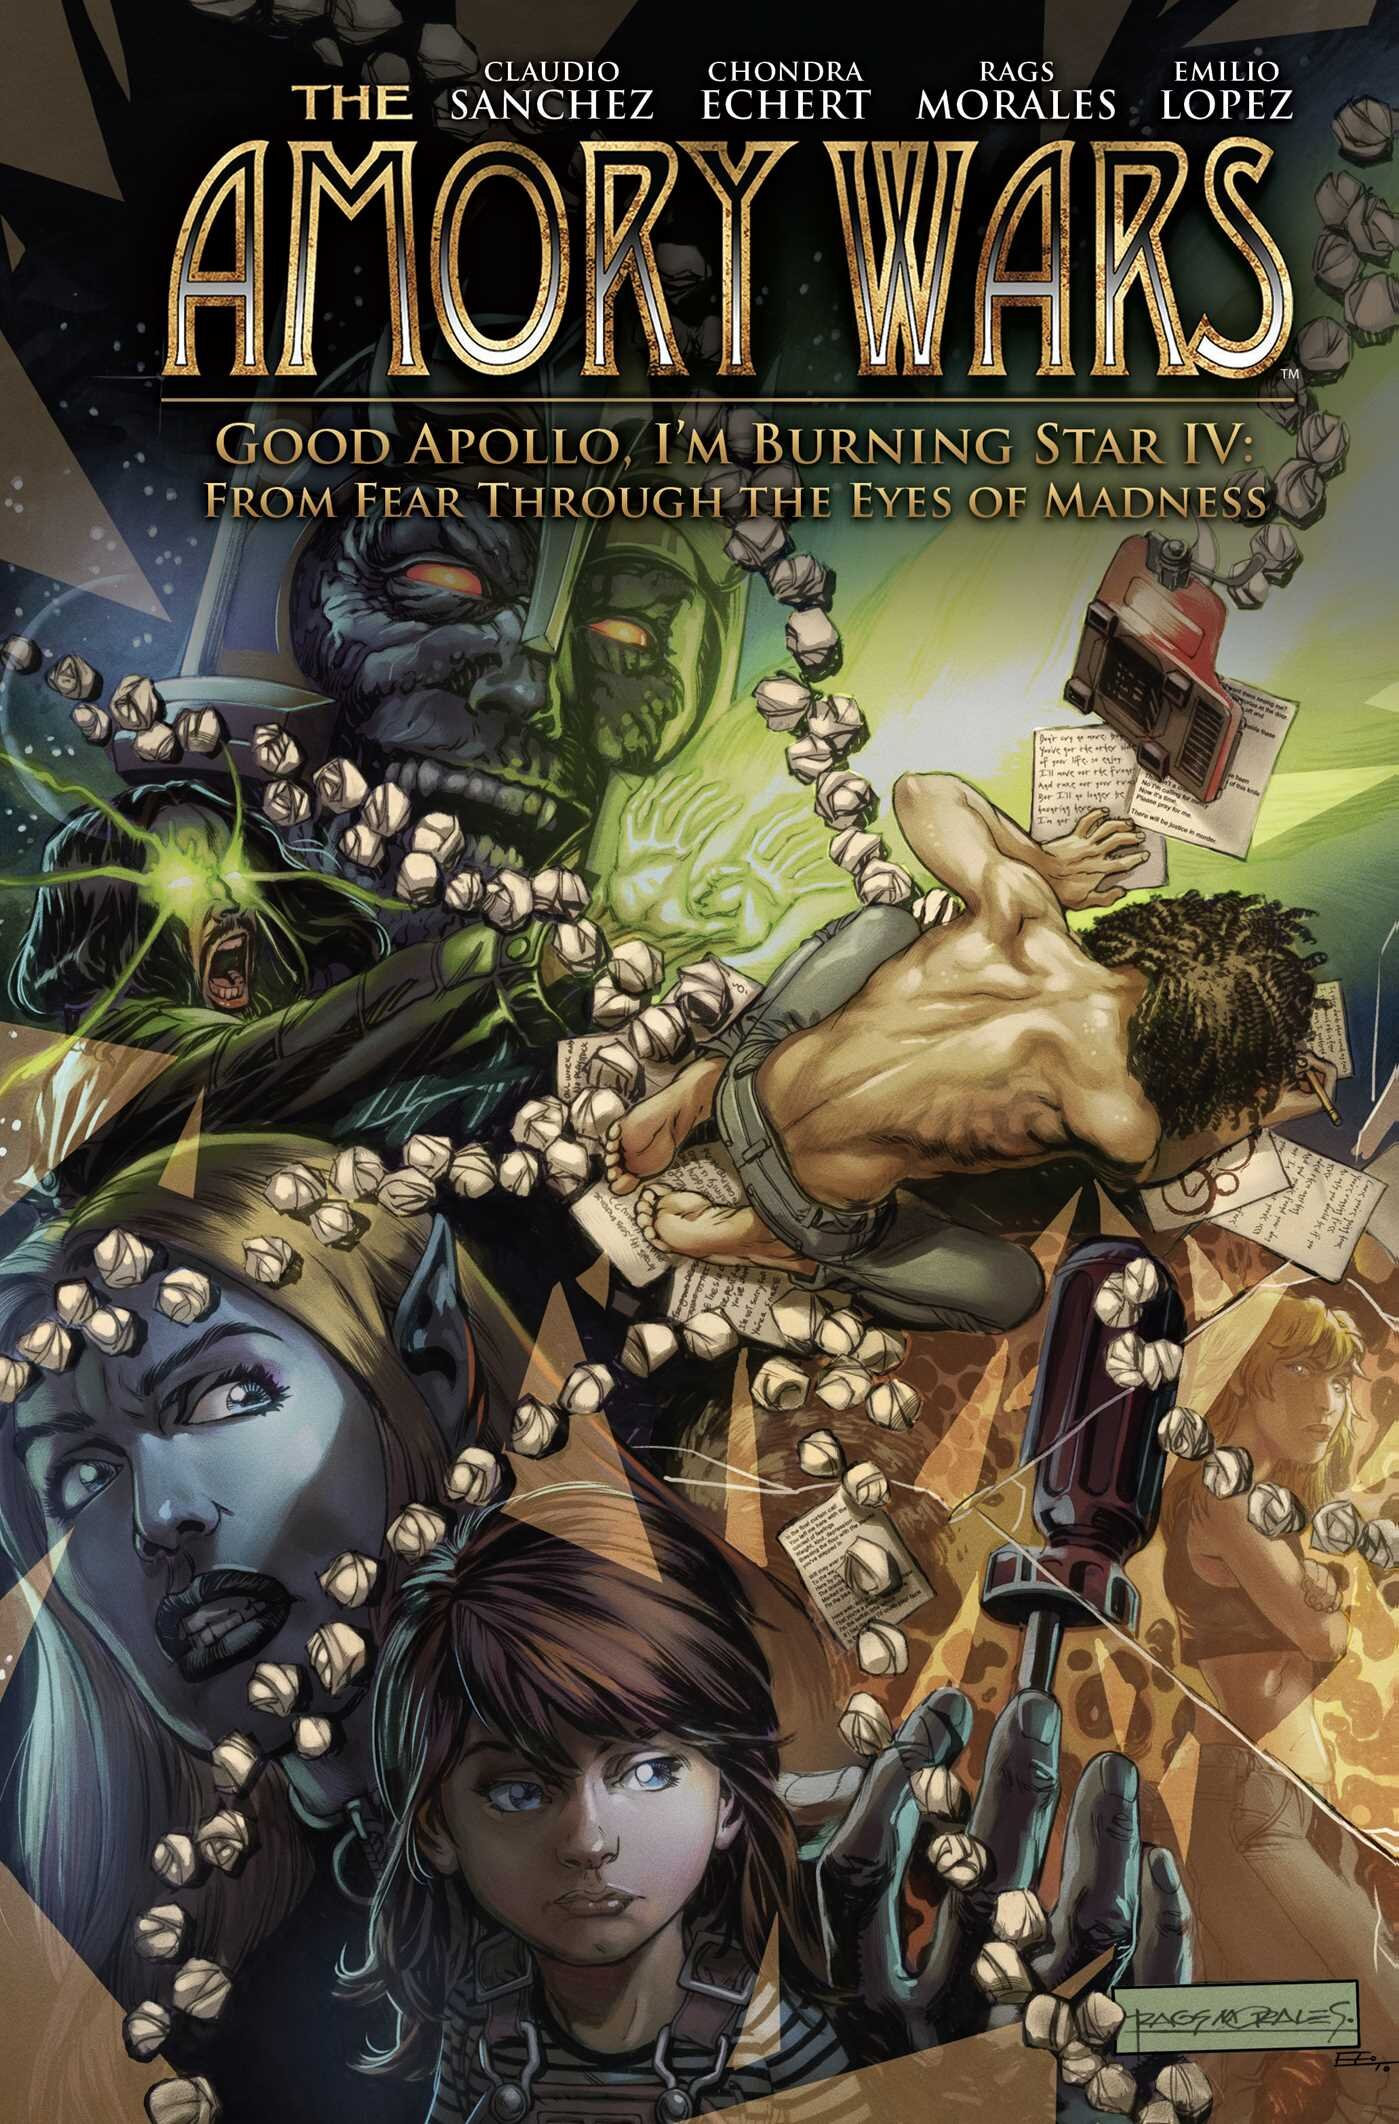 the-amory-wars-good-apollo-im-burning-star-iv-ultimate-edition-9781684155149_hr.jpg